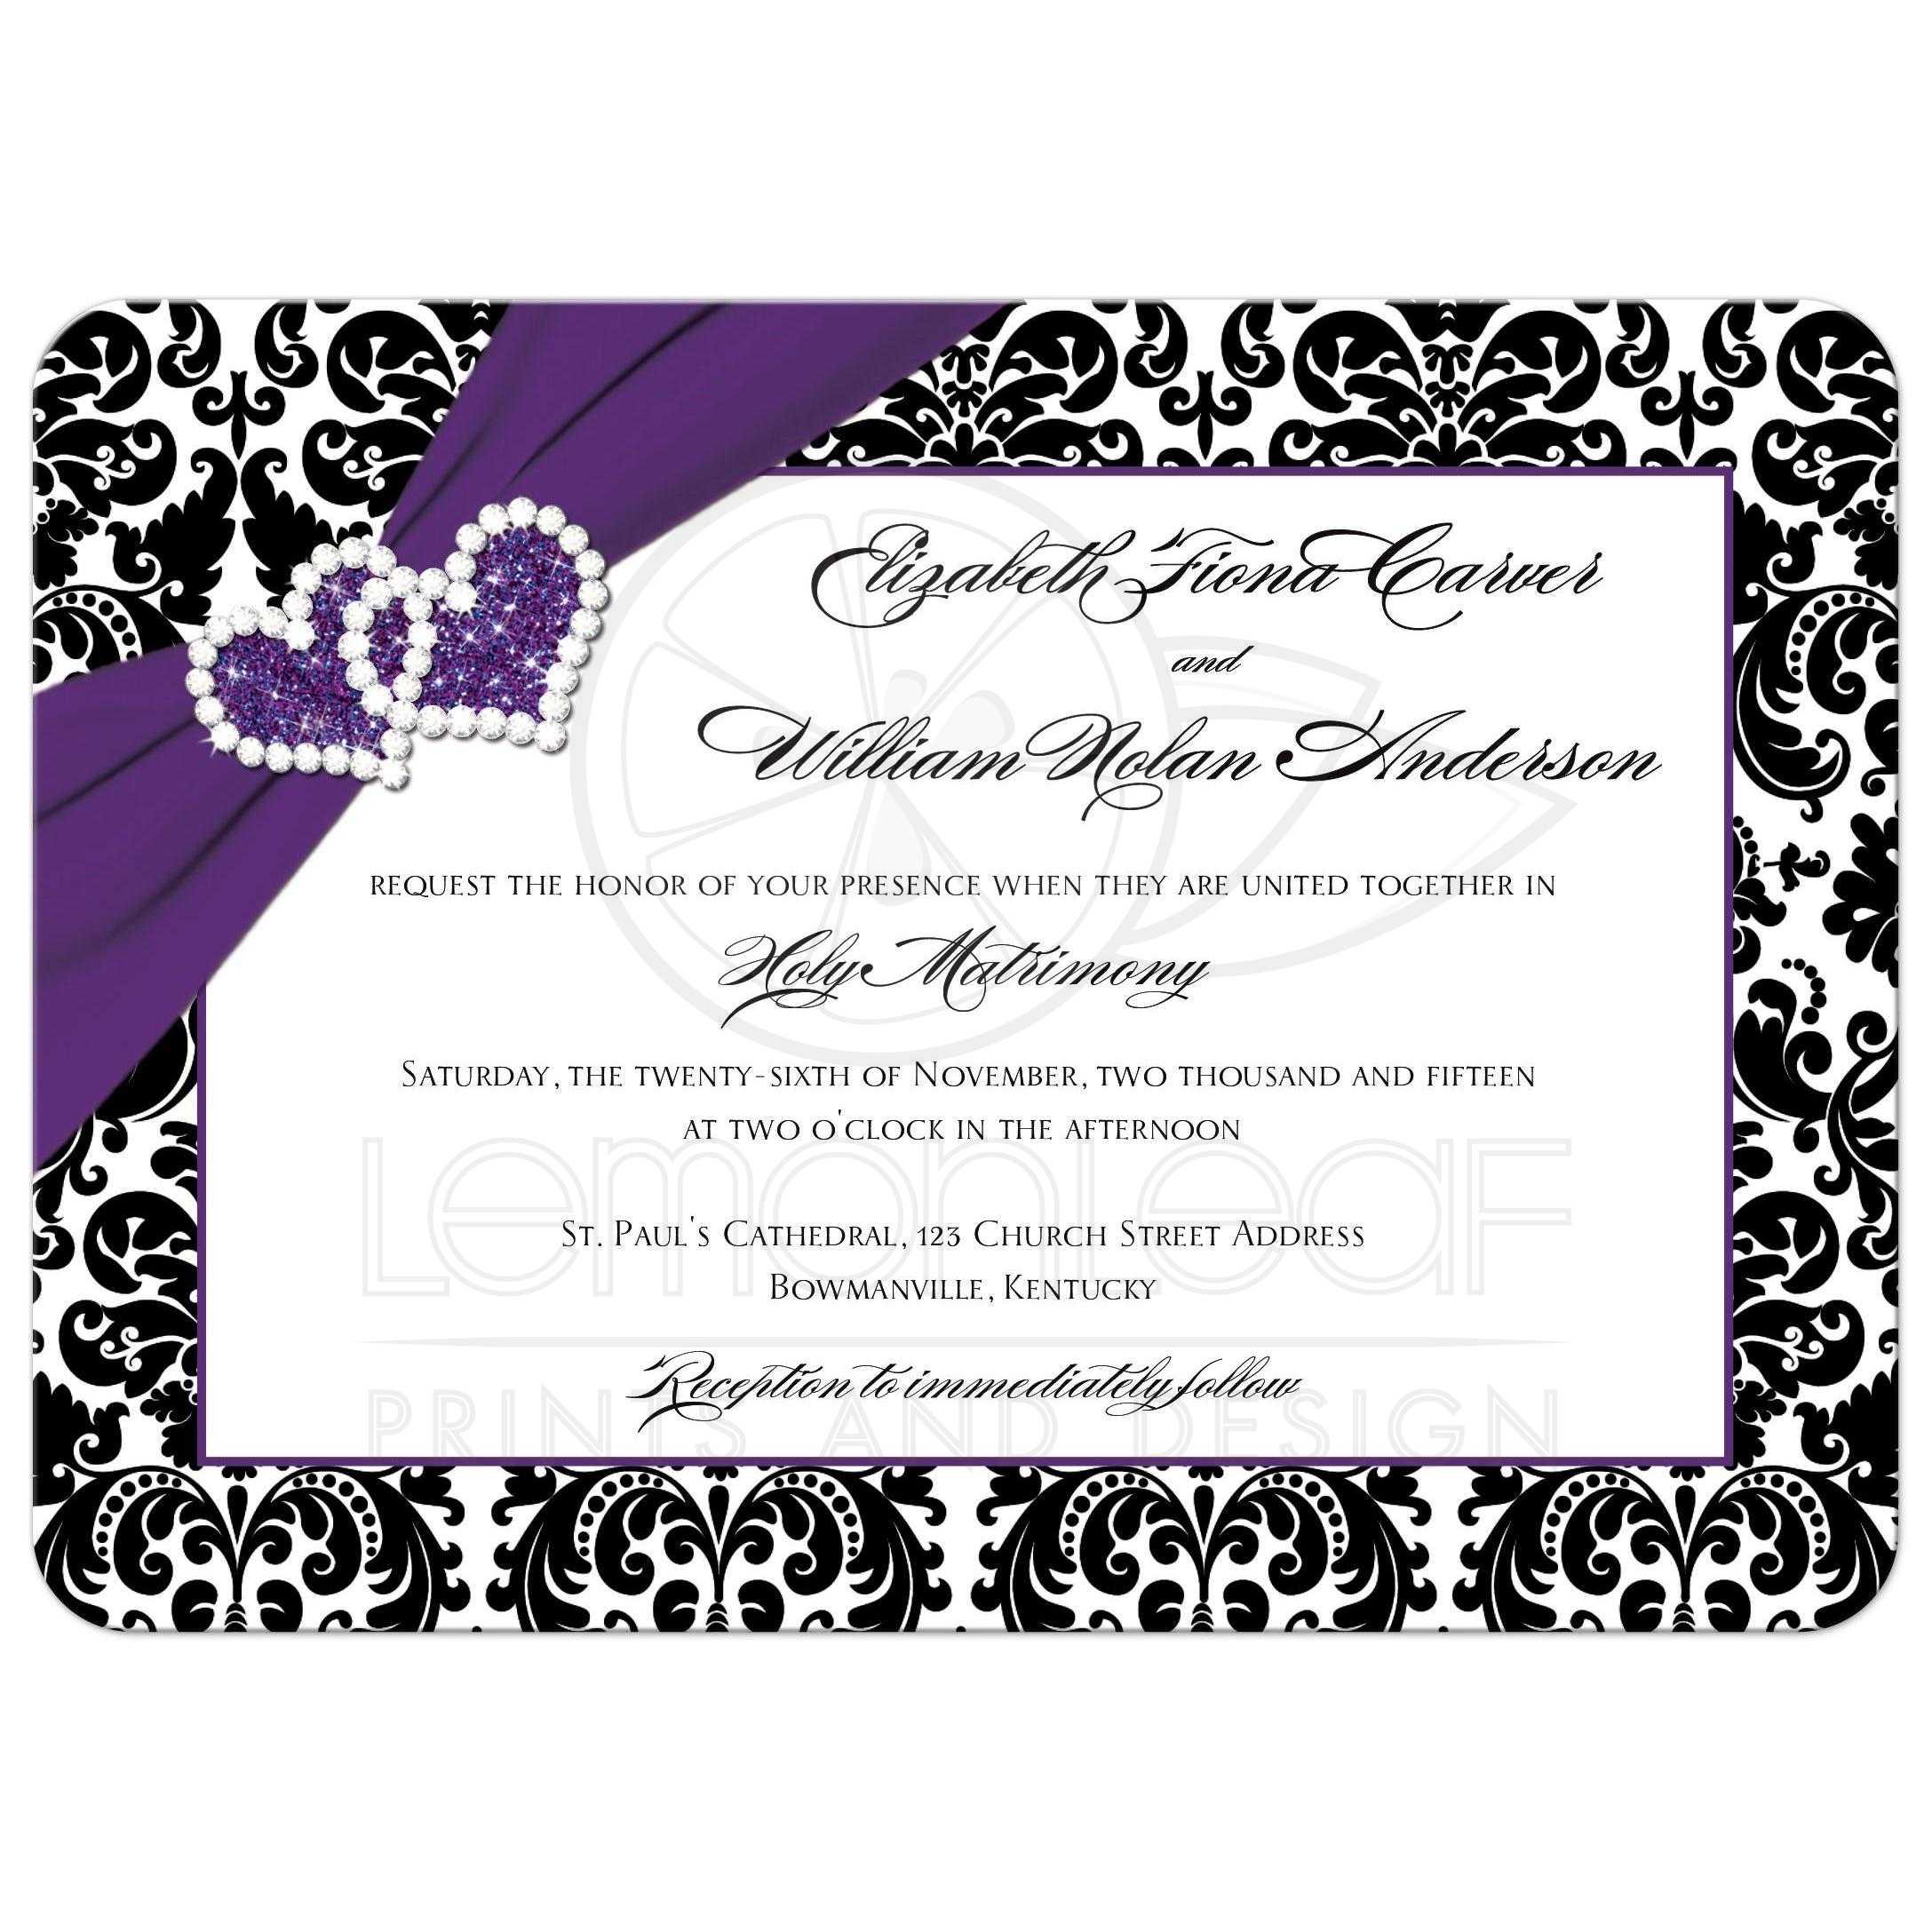 Wedding Invitation | Purple, Black, White Damask | Joined Hearts